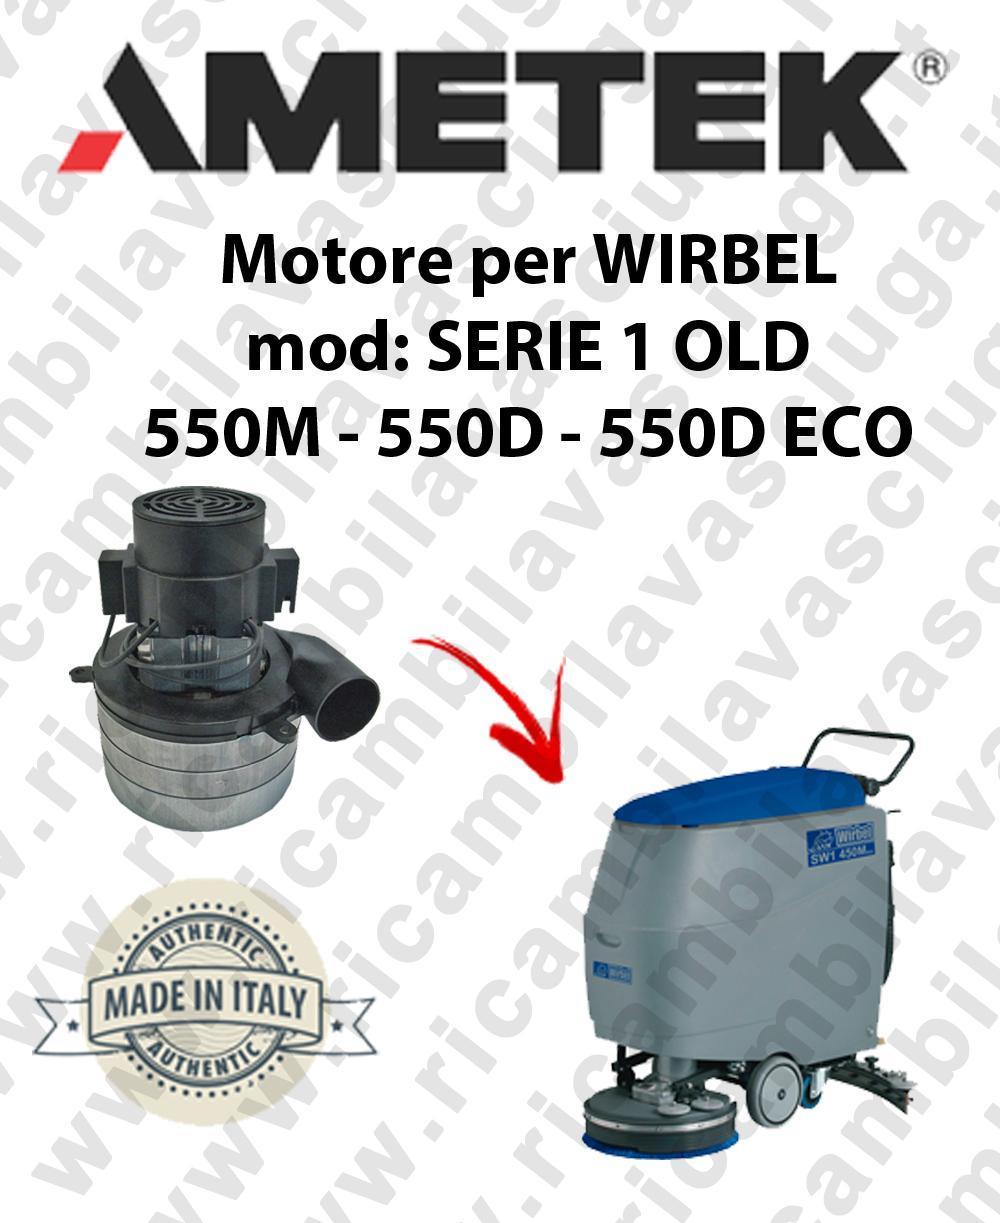 SERIE 1 OLD 550M 550D 550D ECO Ametek vacuum motor for scrubber dryer WIRBEL